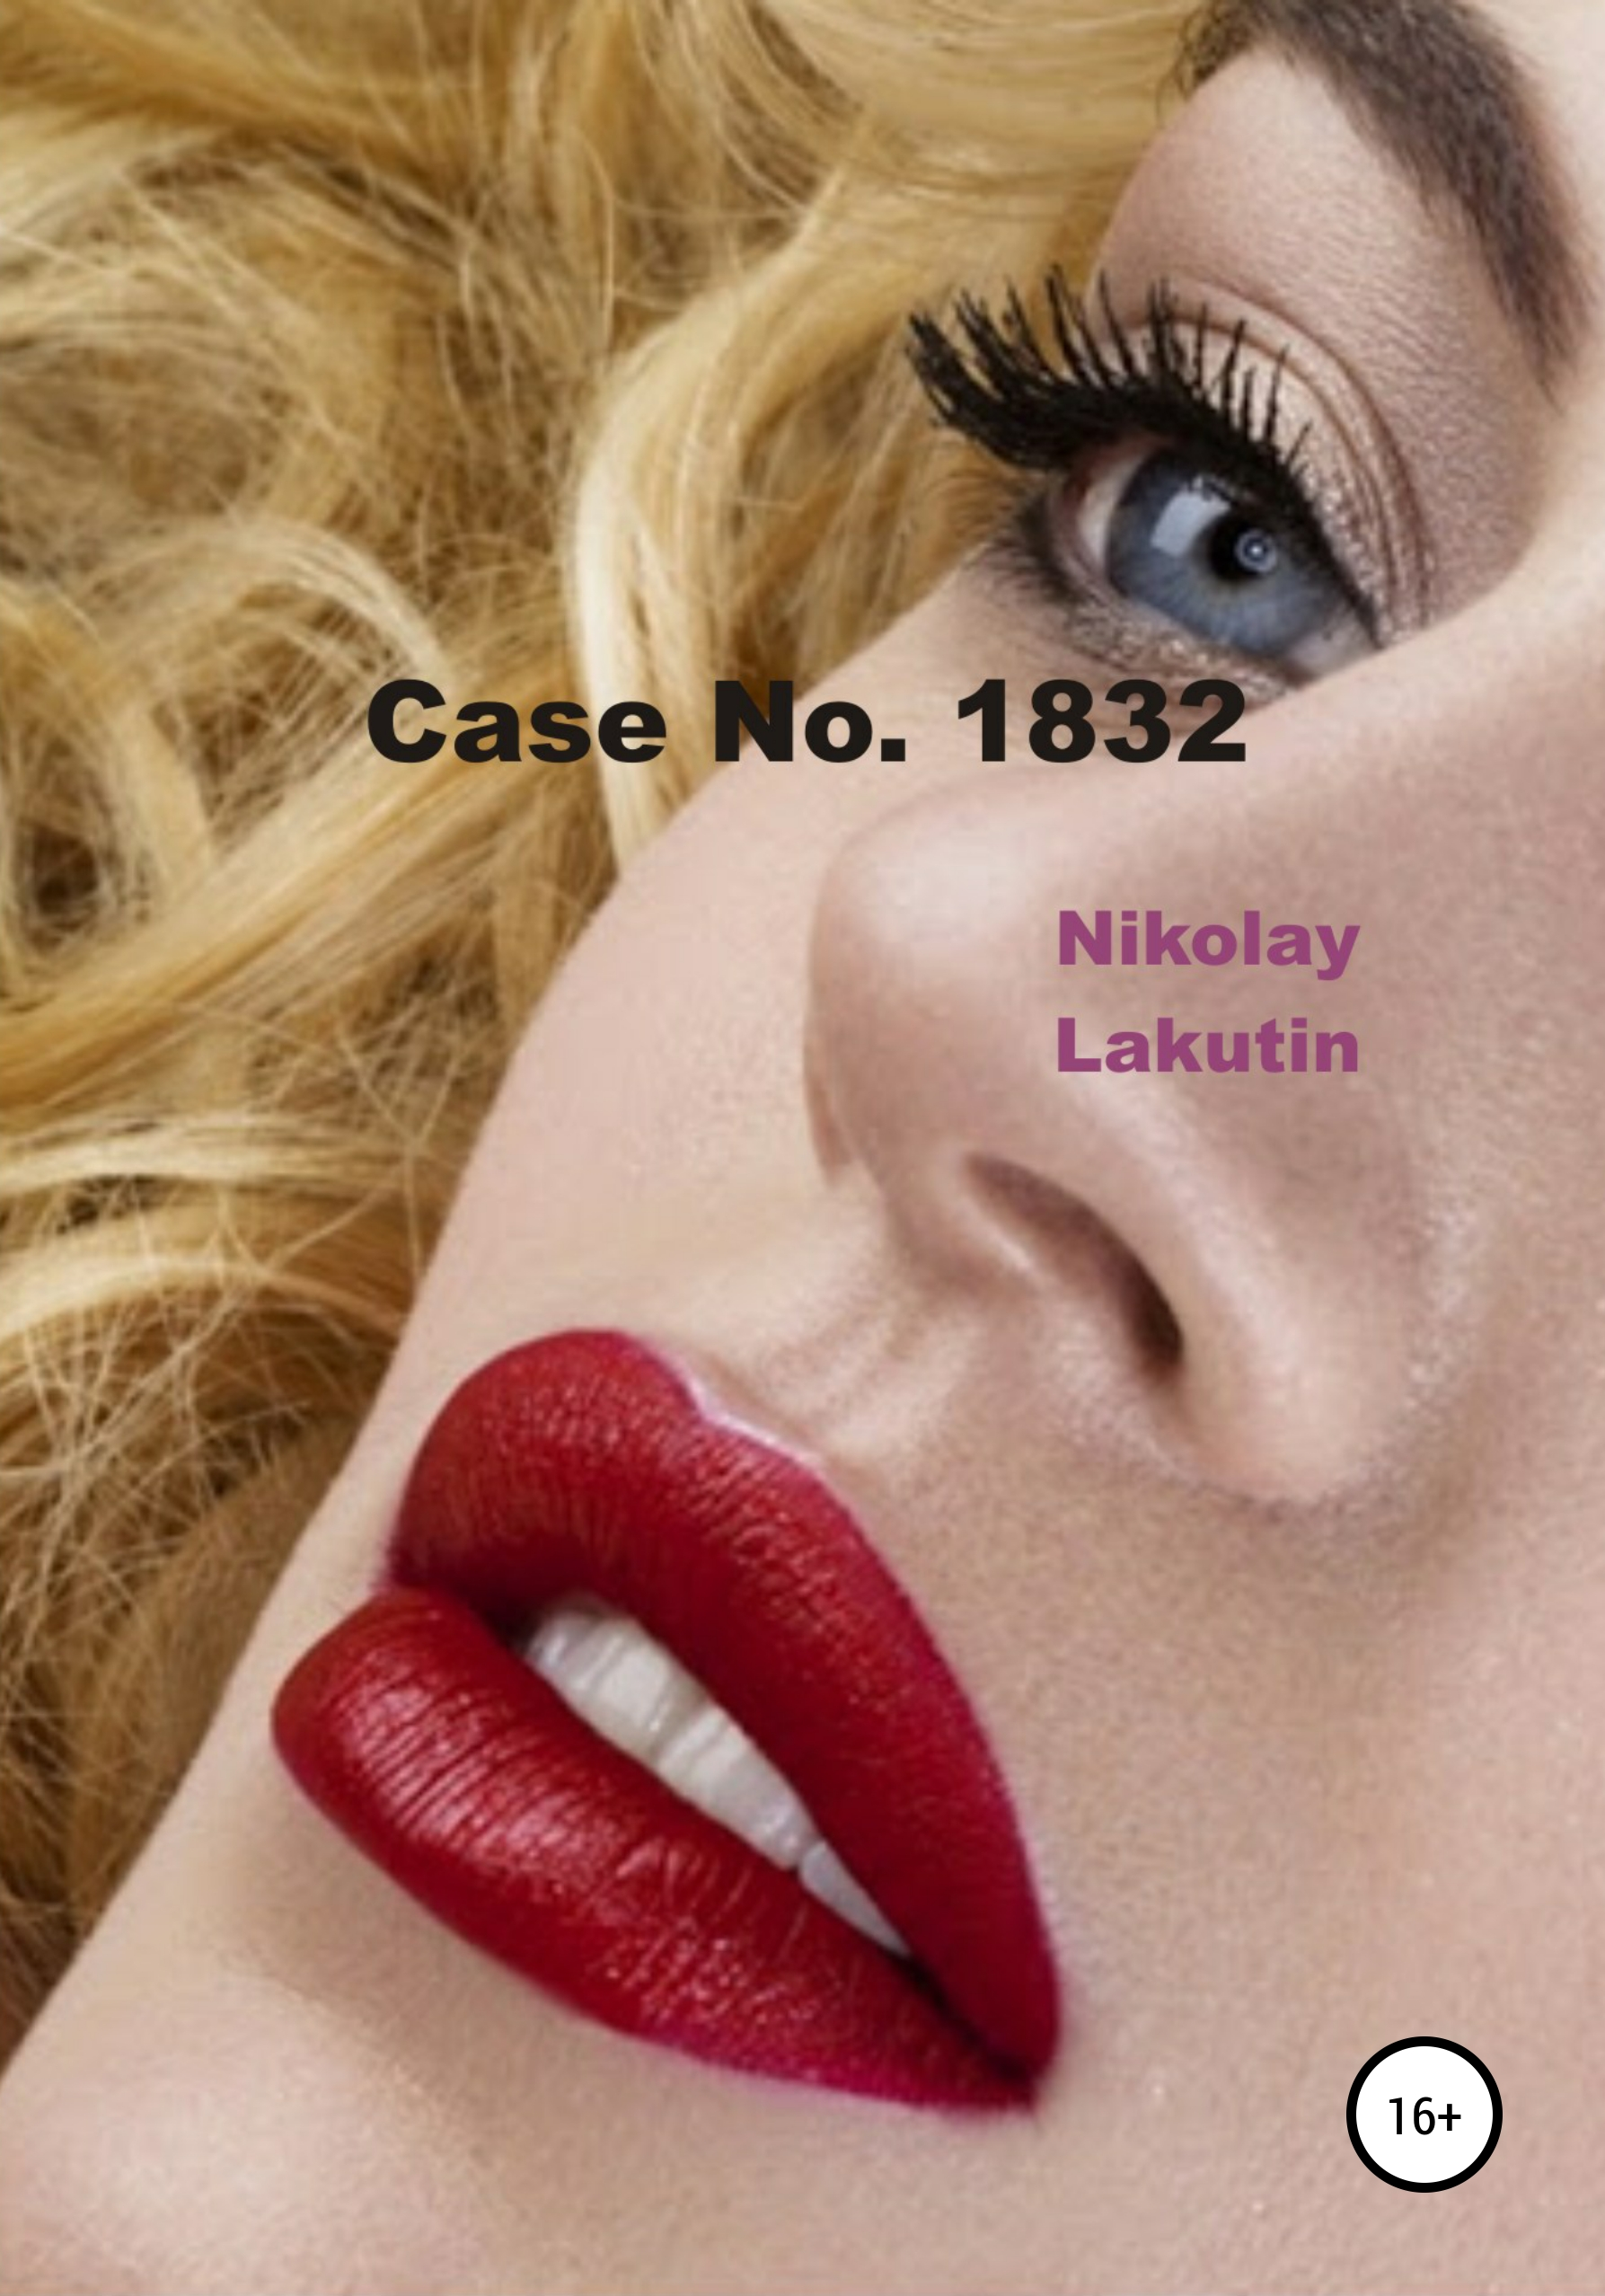 Nikolay Lakutin Case No. 1832 the temptations soul legends the temptations page 1